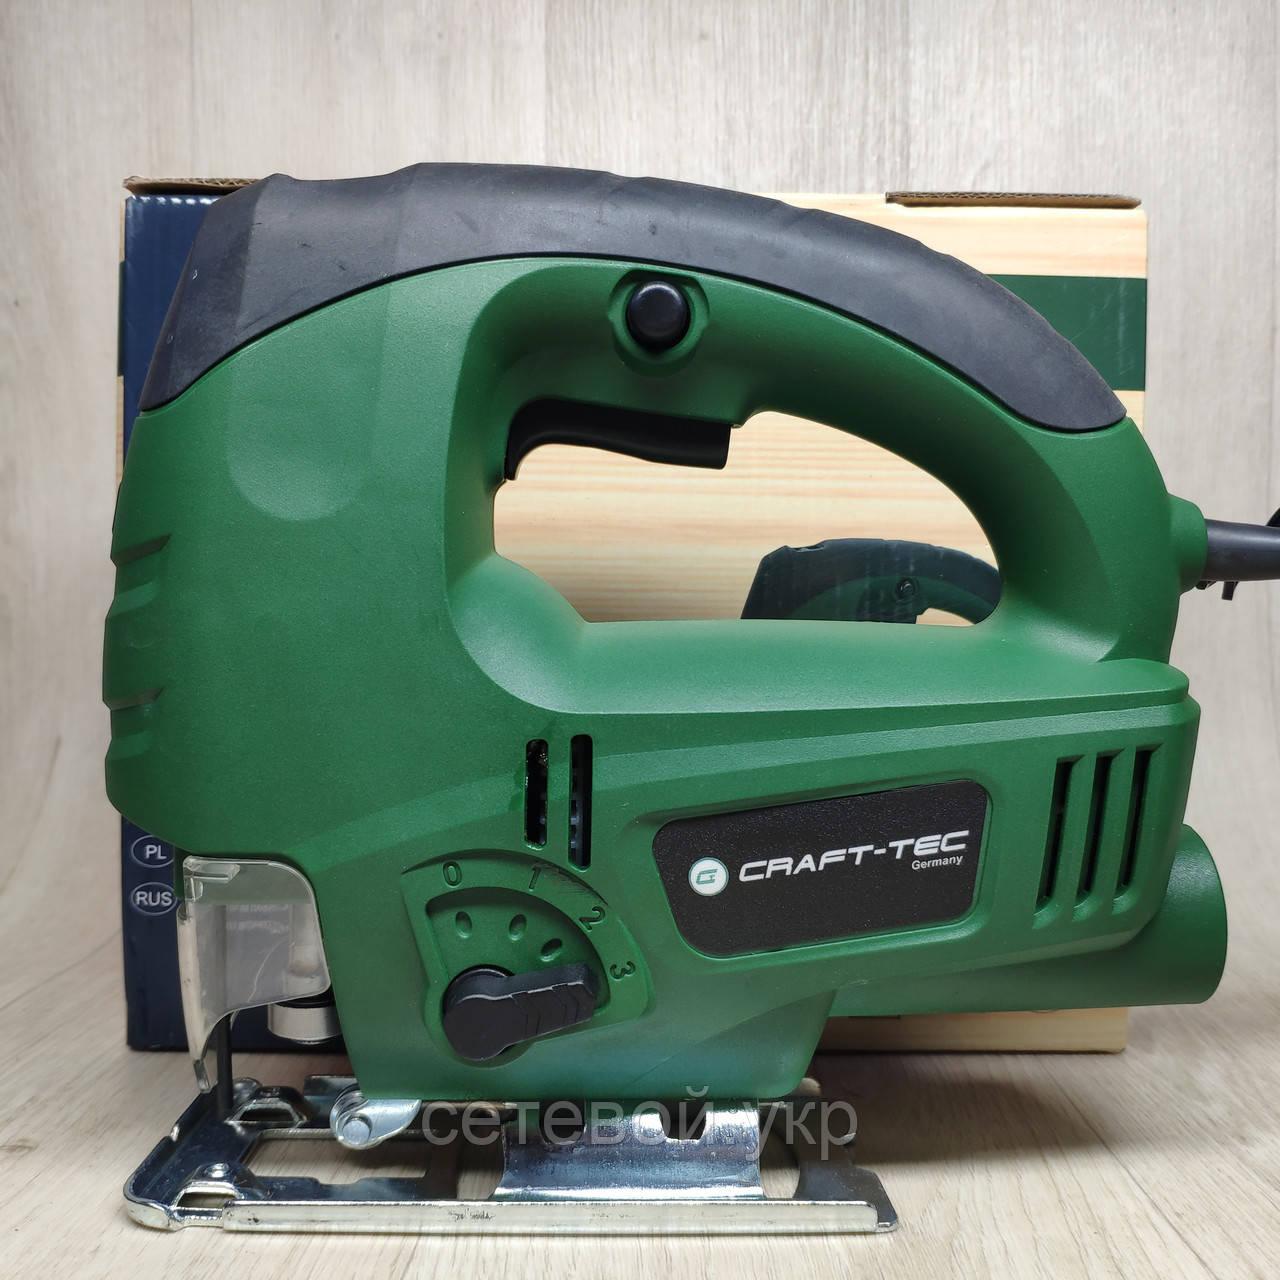 Електричний лобзик Craft-tec PXJS-65 з лазером електролобзик